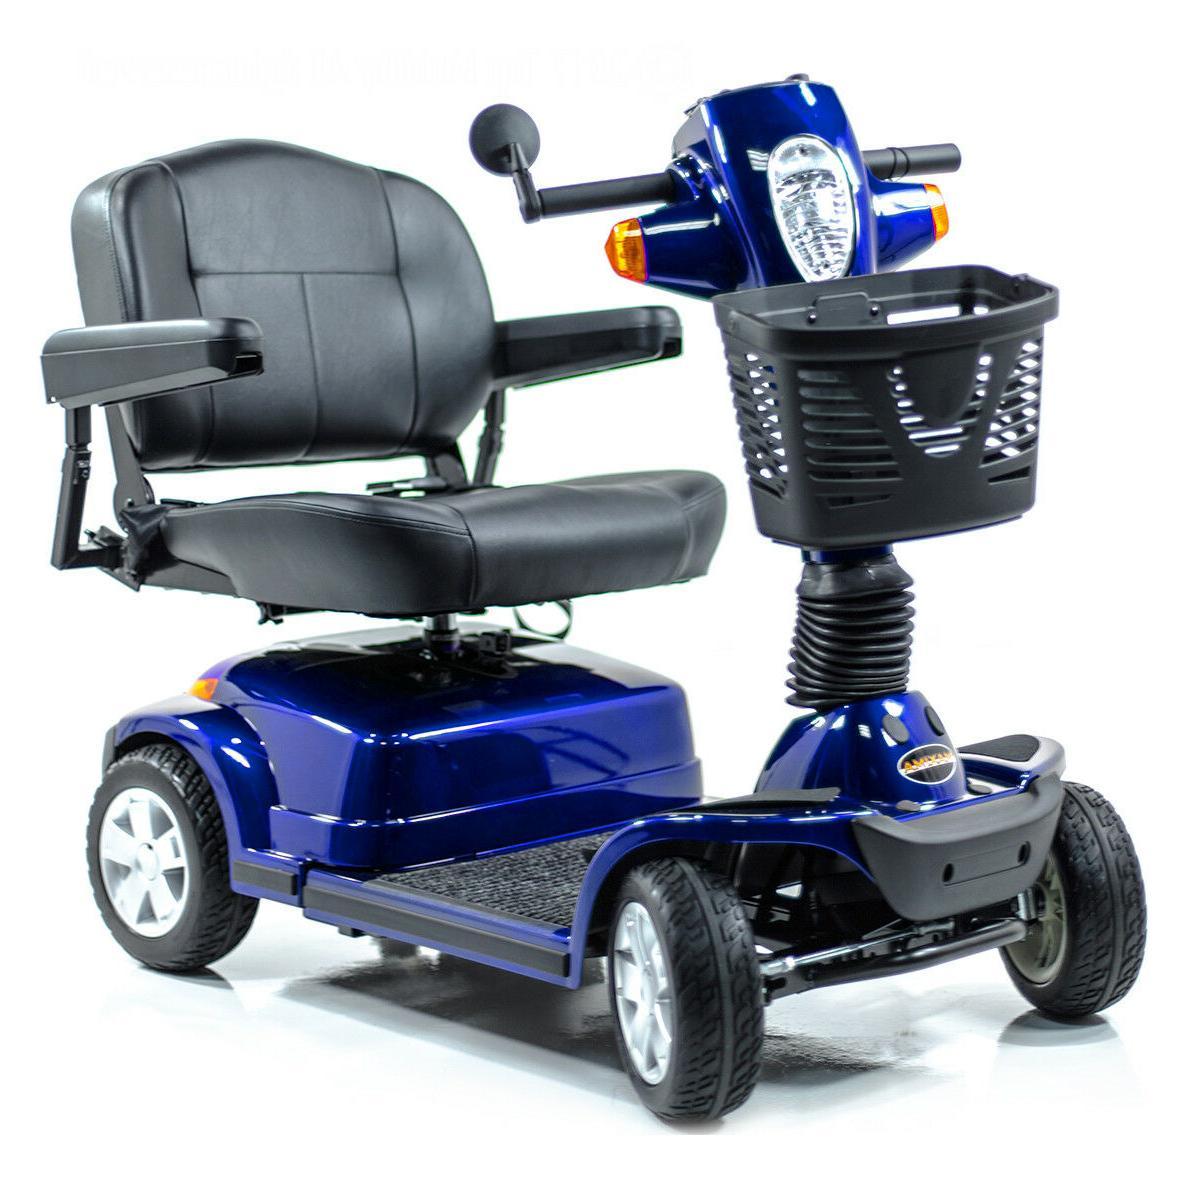 Pride Mobility MAXIMA Bariatric 500 lbs Heavy Duty Electric